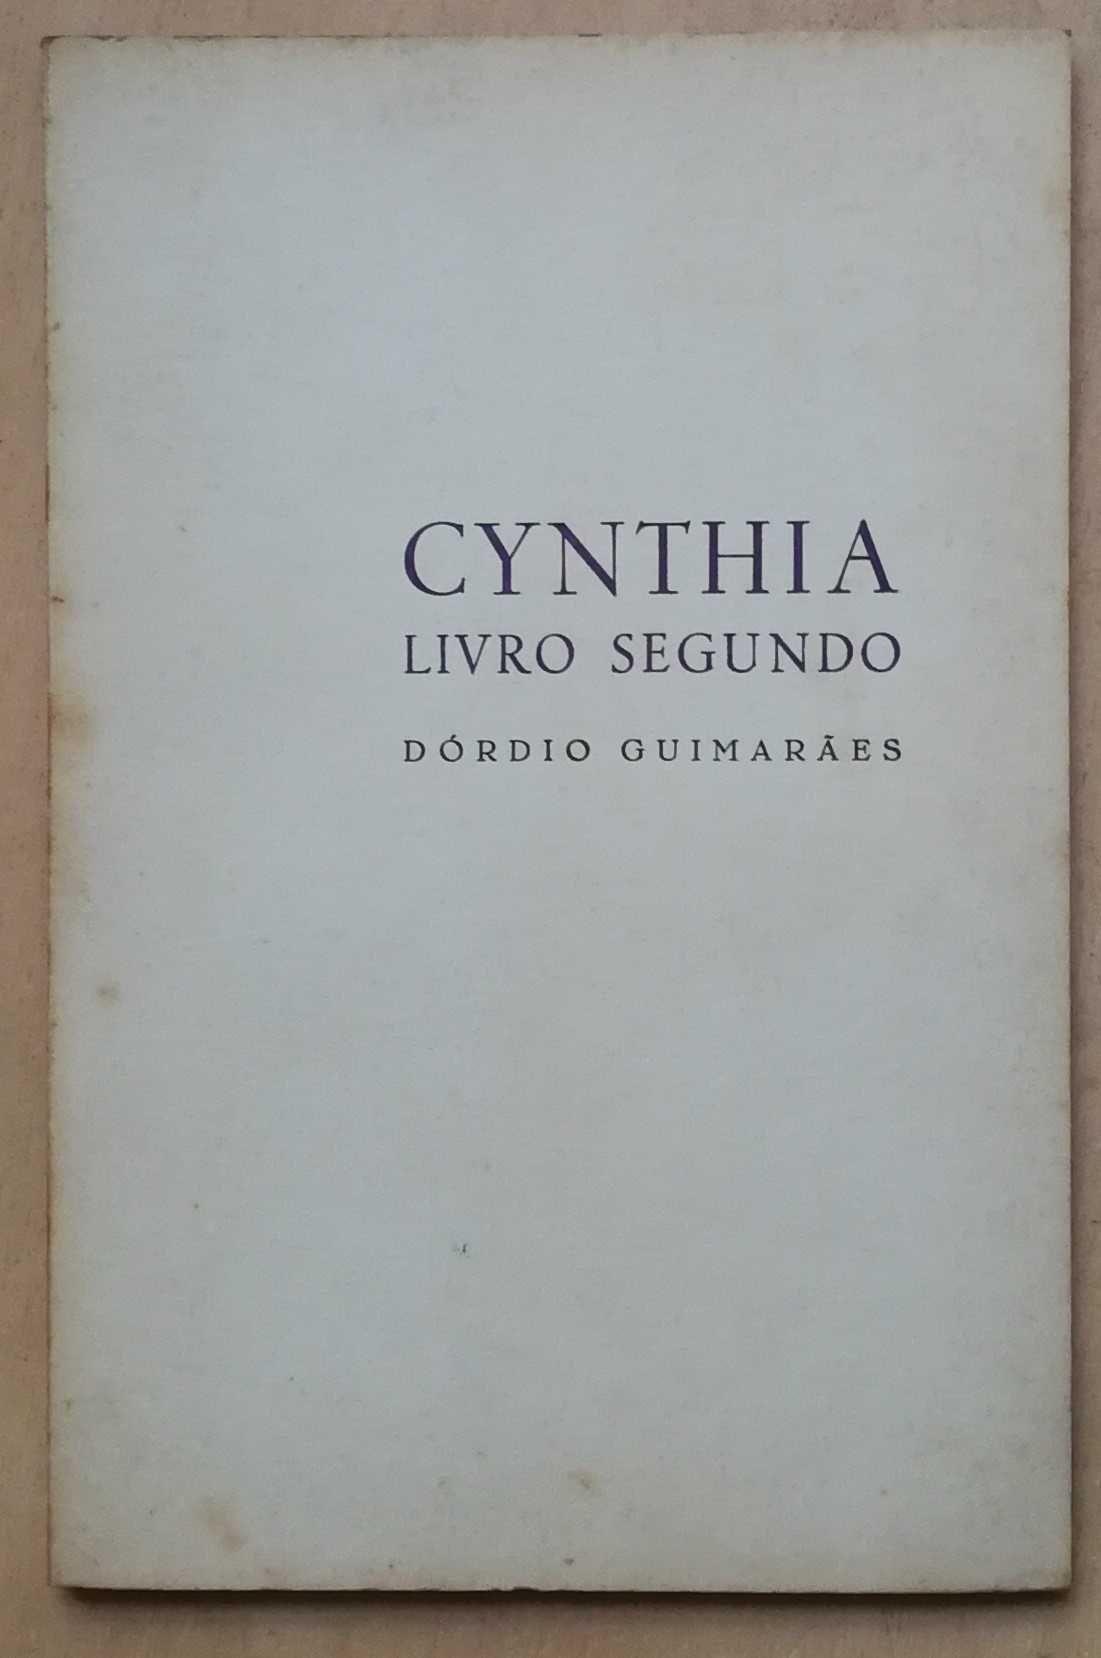 cynthia, livro segundo, dórdio guimarães